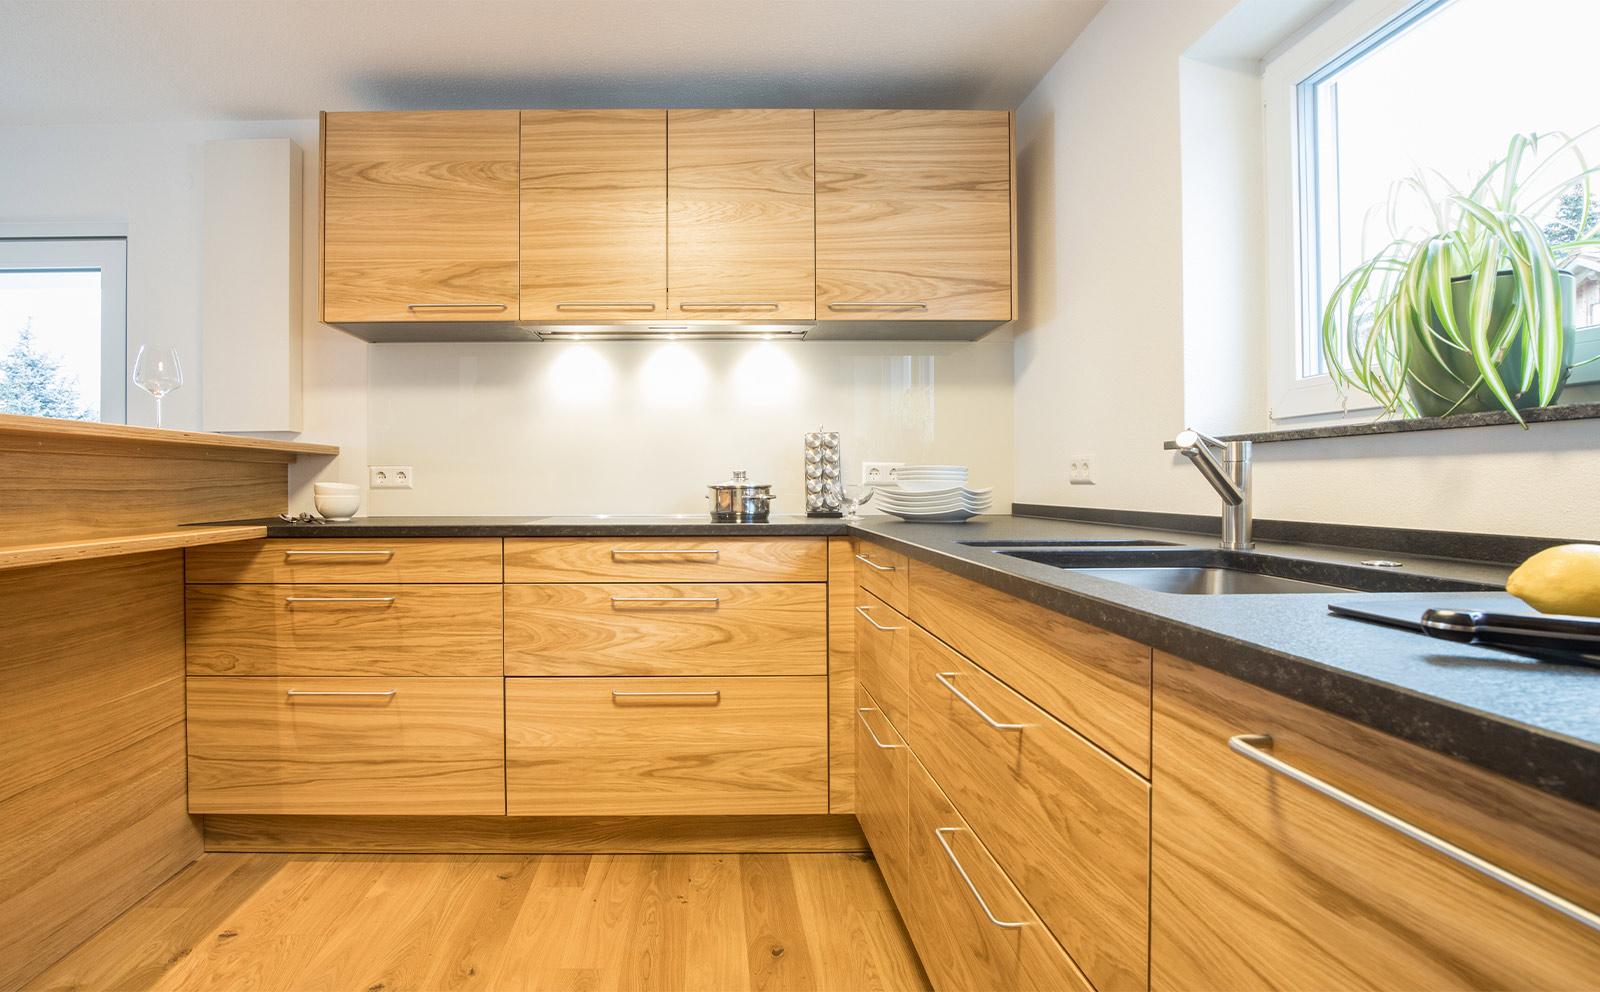 U-Küche in Holz